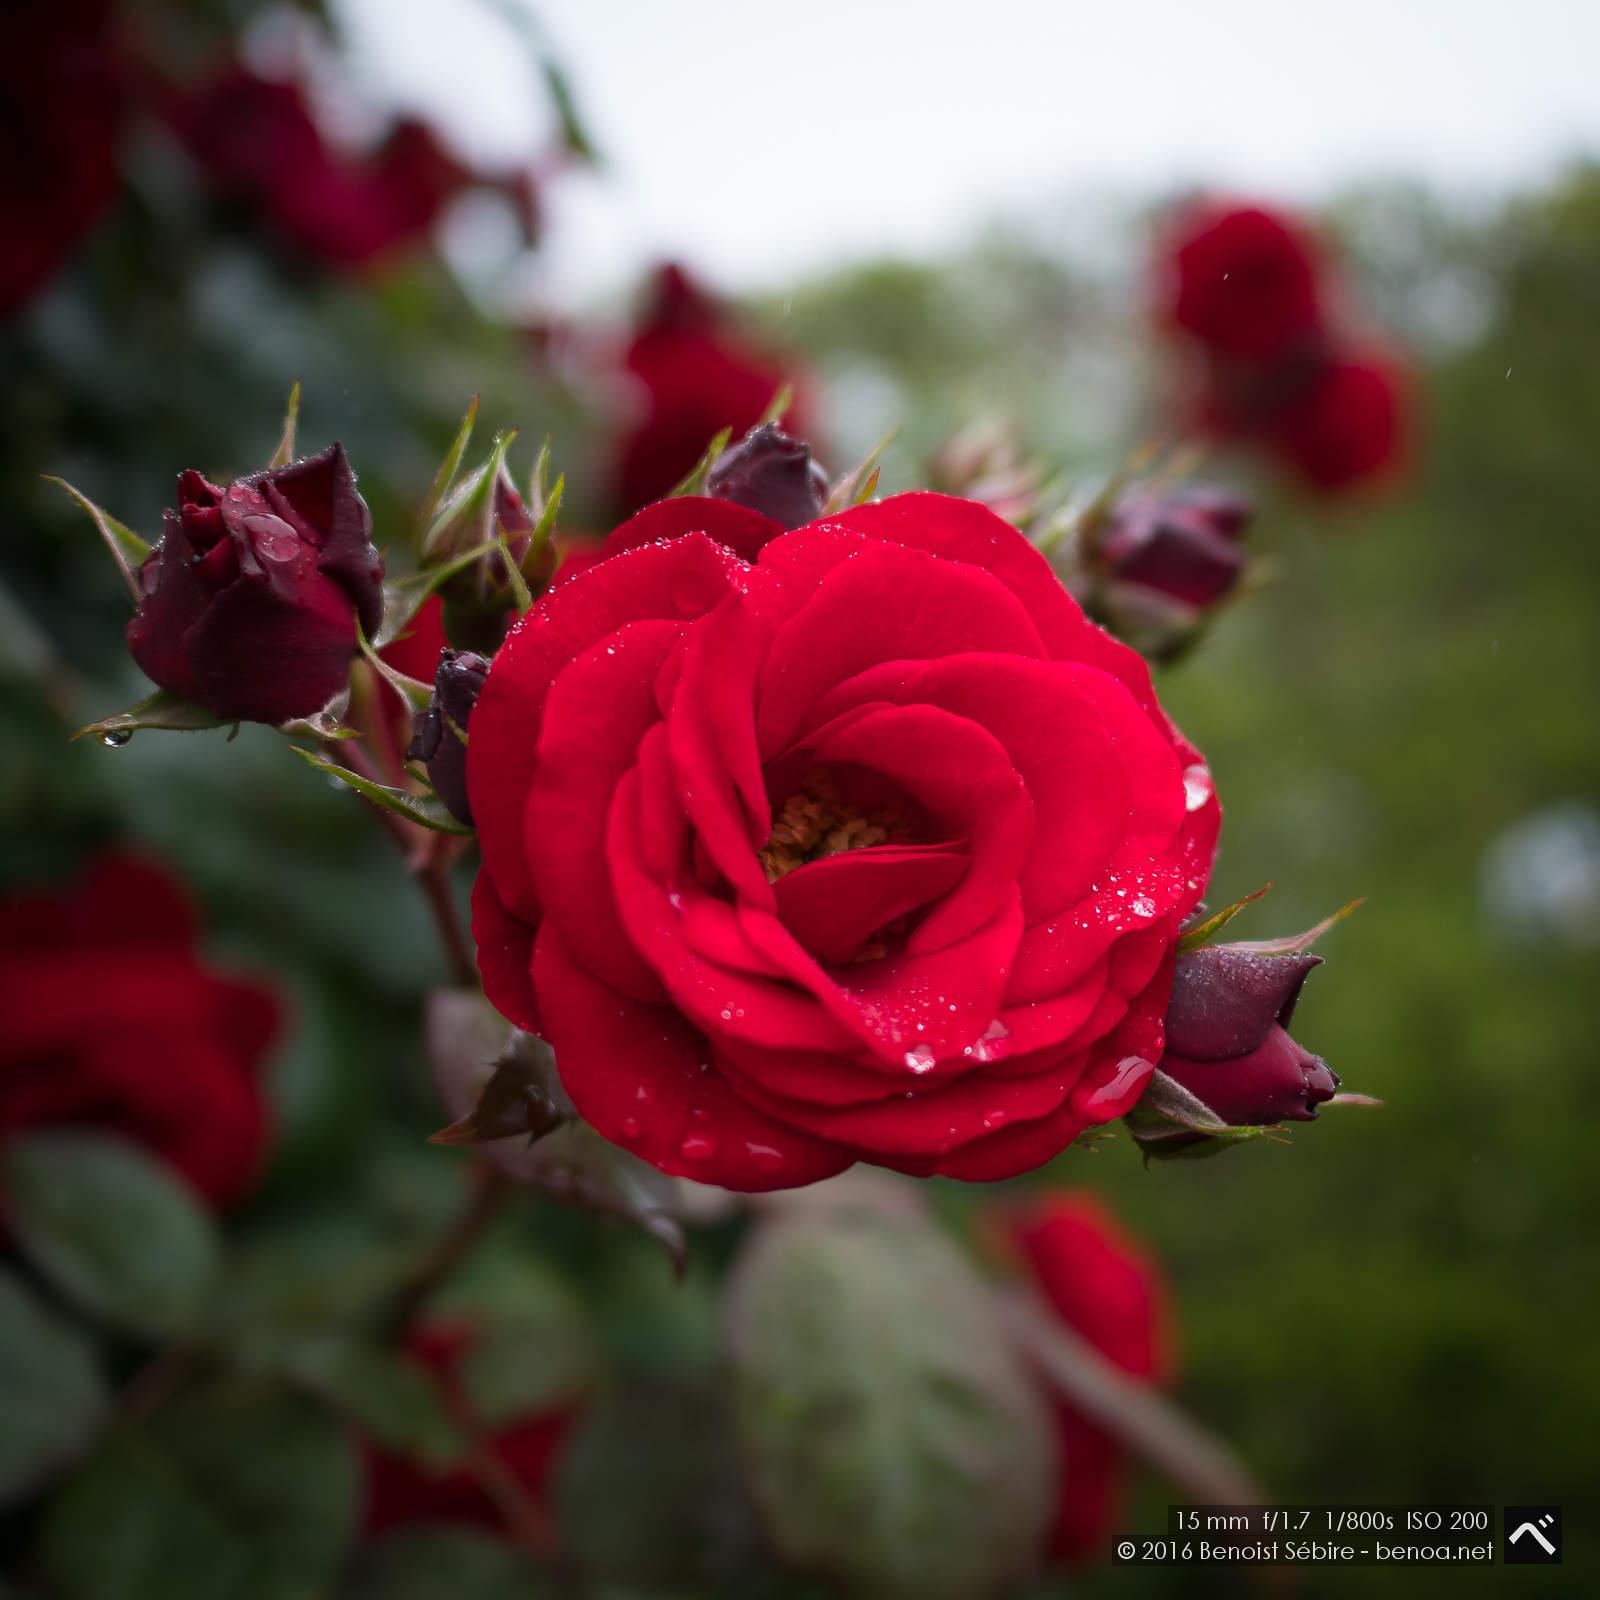 Roses and Rain